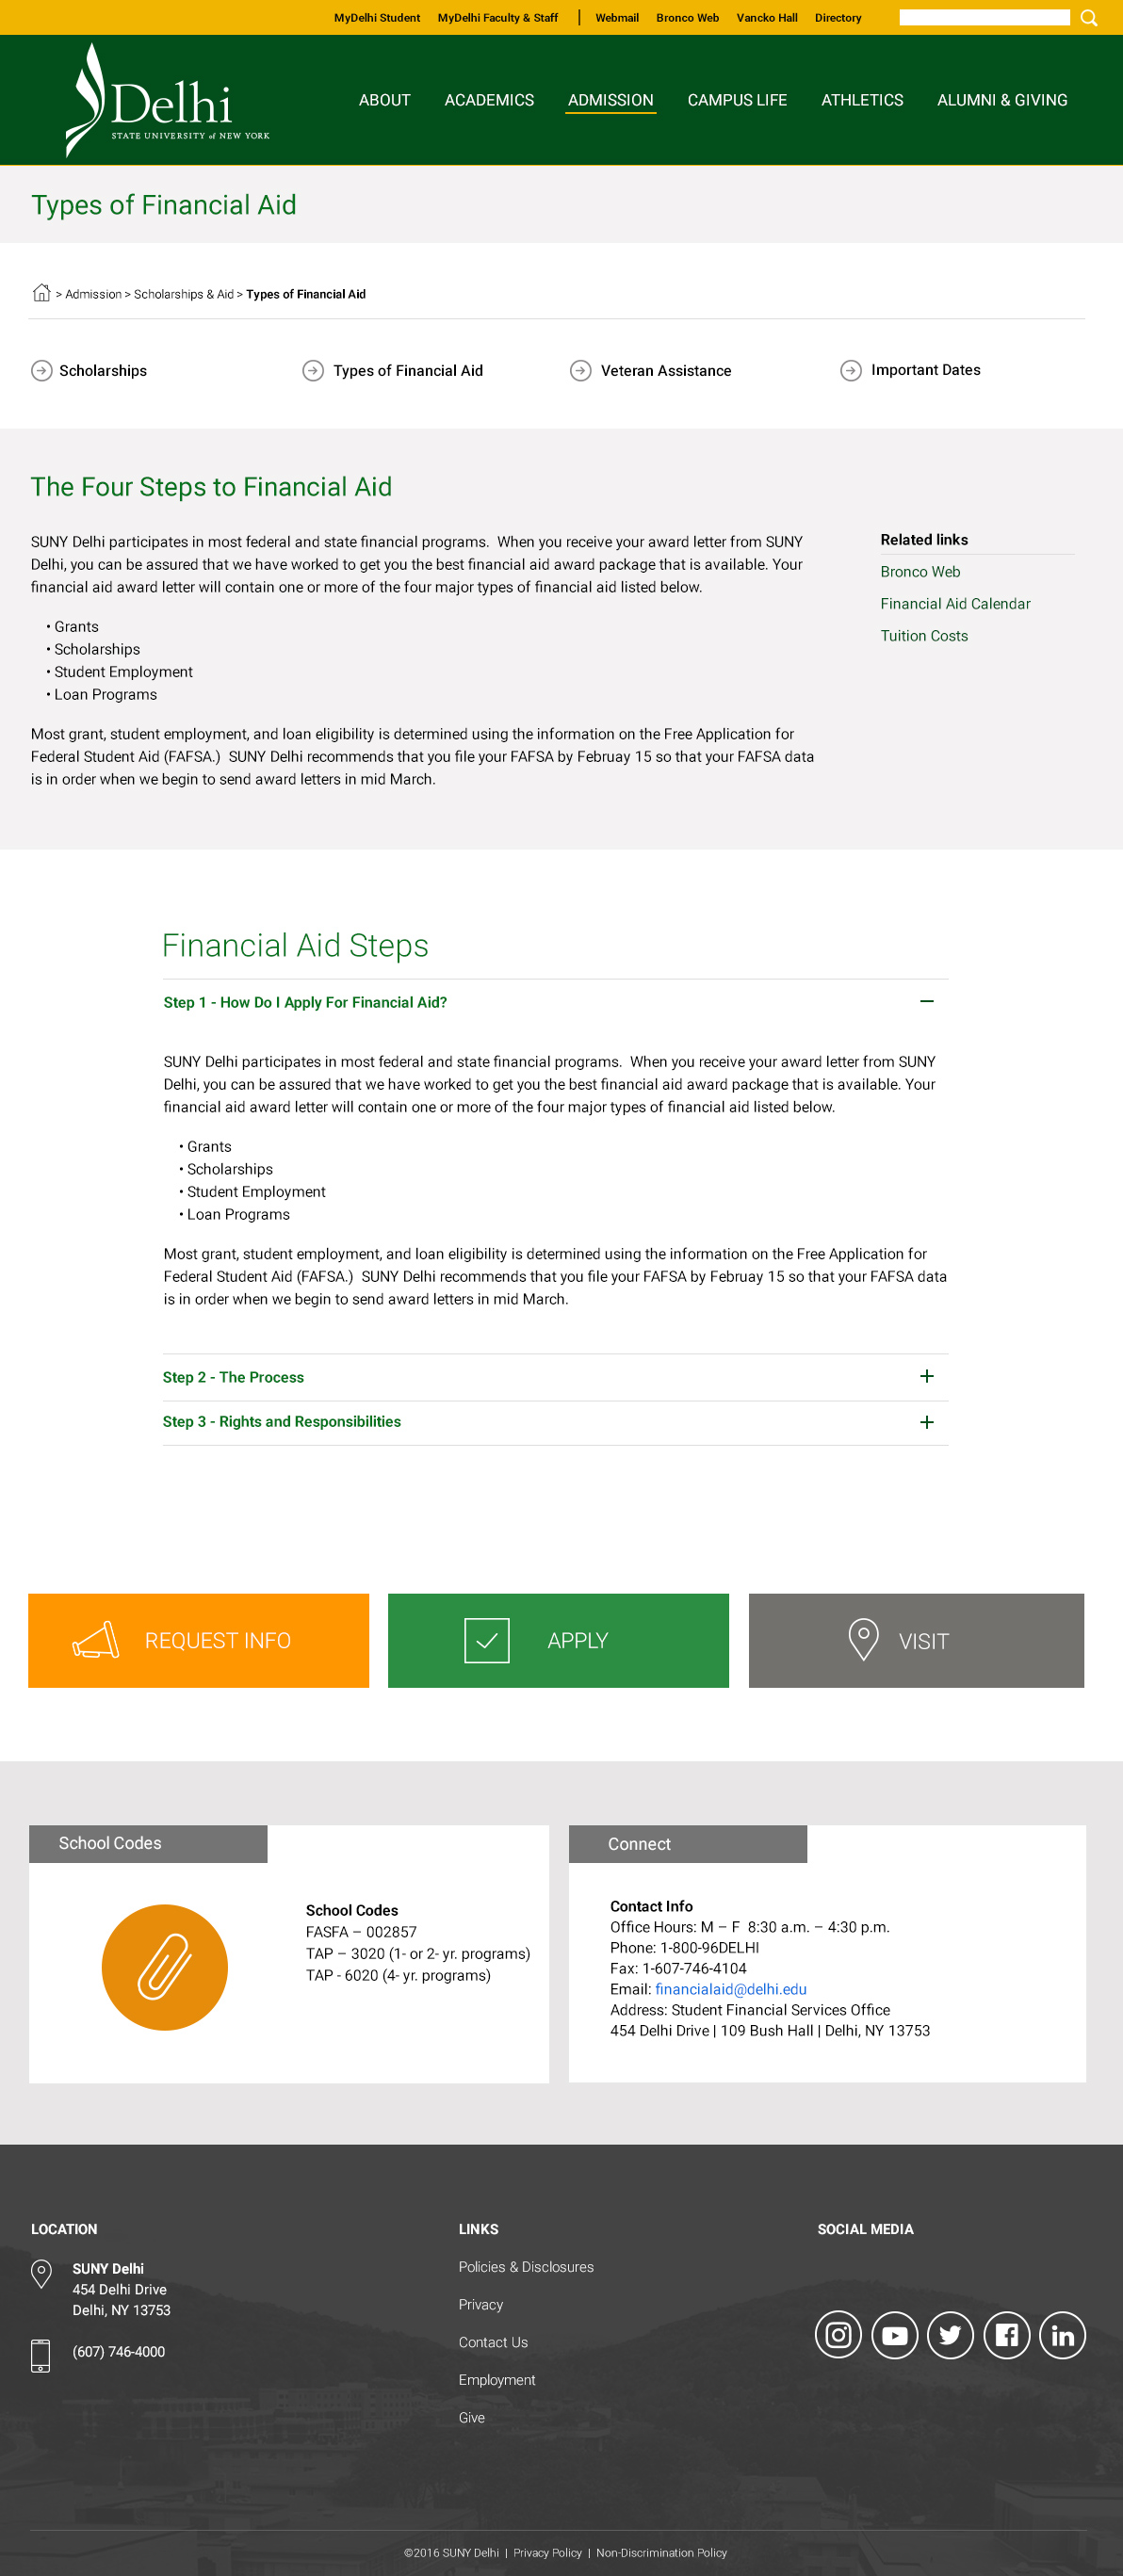 sunydelhi-typesfinancialaid-tier-4-1170-design2a